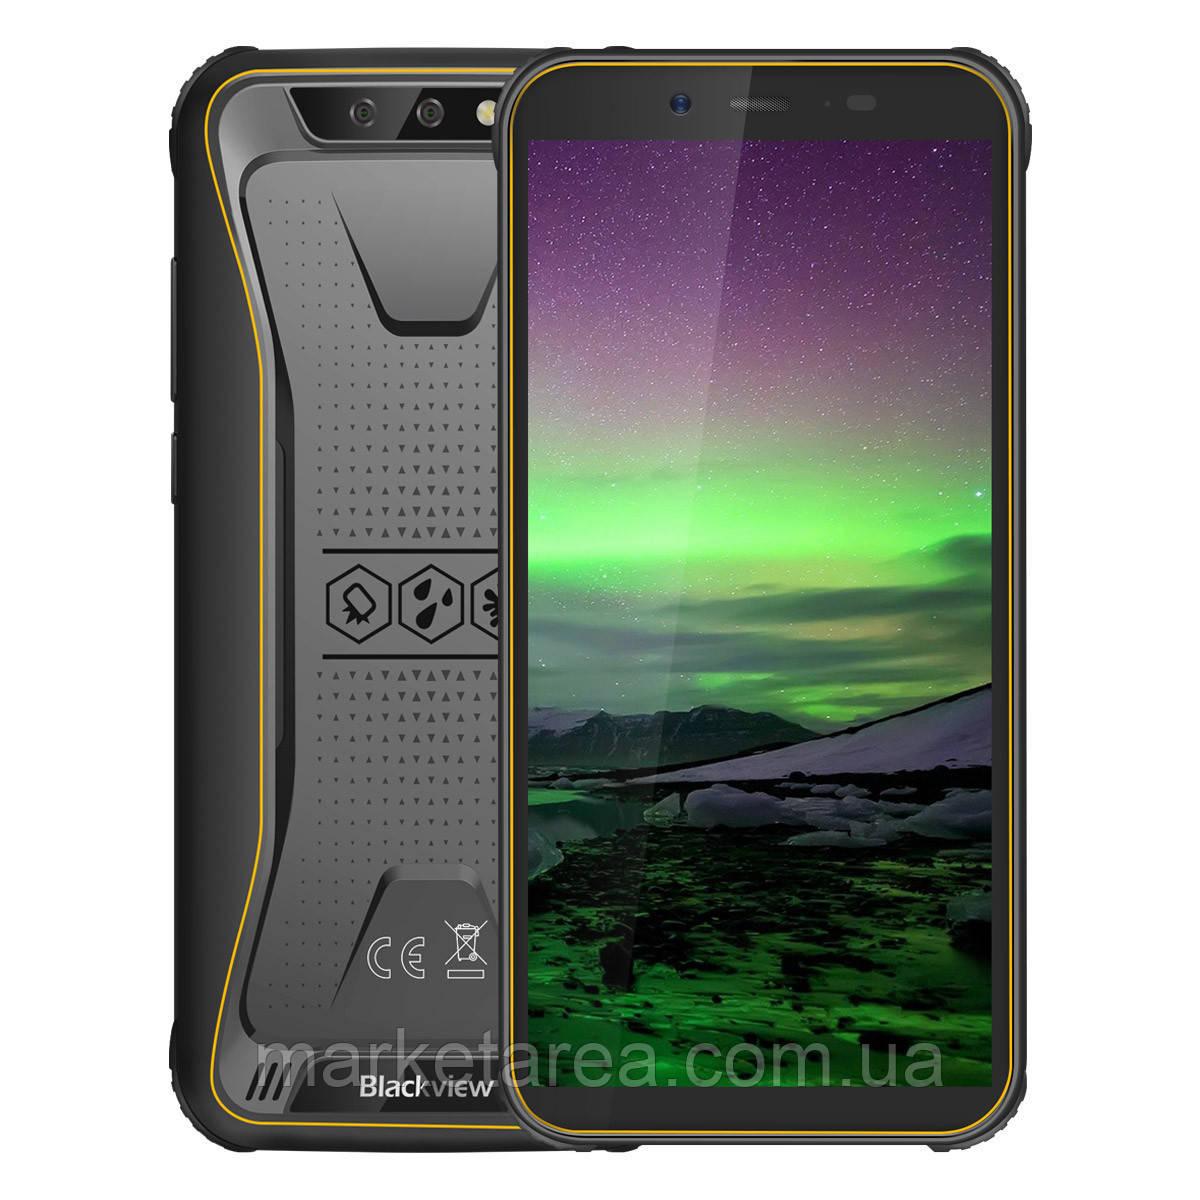 Смартфон Blackview BV 5500 PRO Yellow 3/16 гб